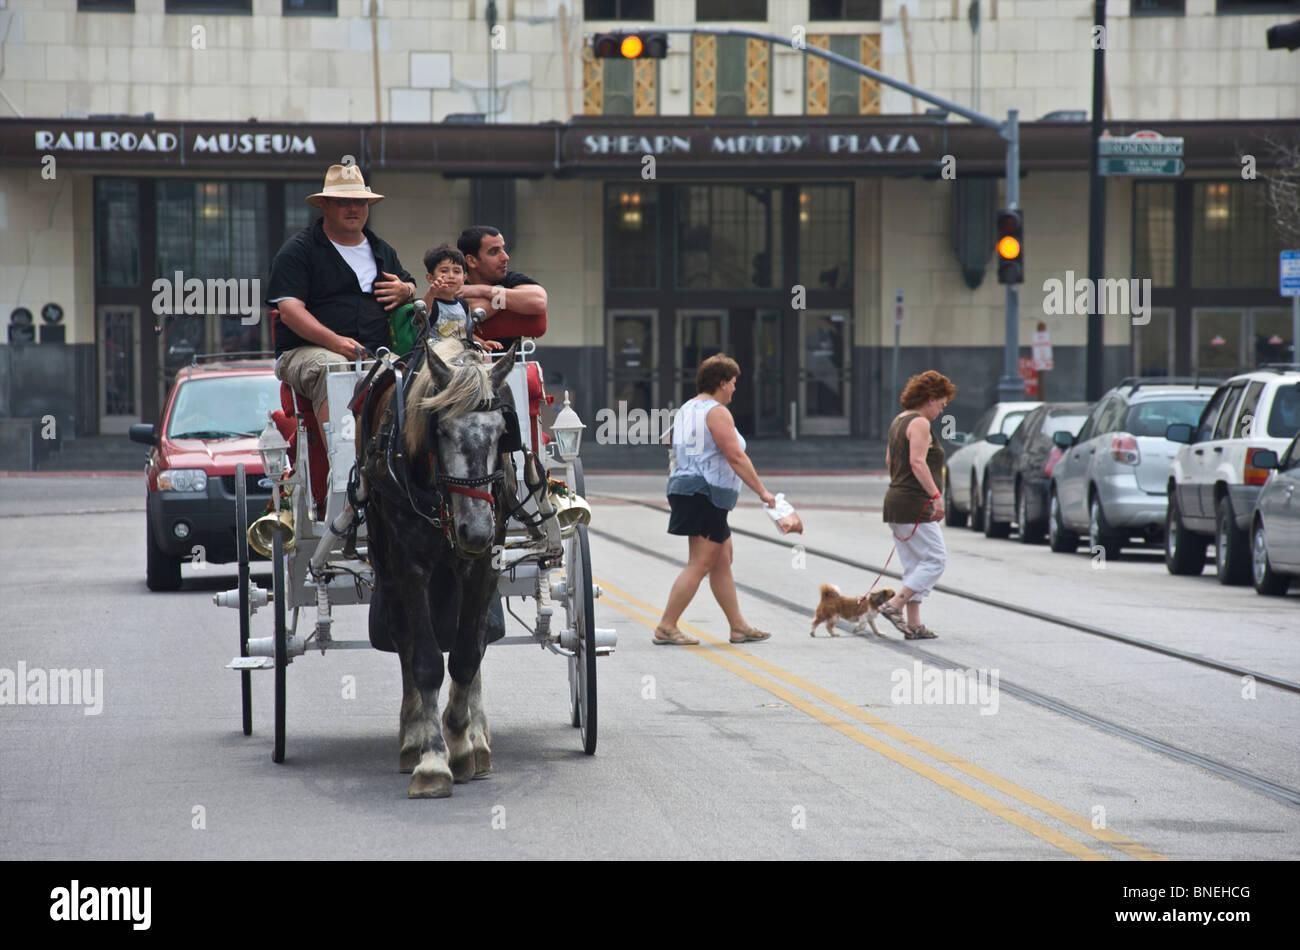 Family riding on horse cart downtown in Galveston, Texas, USA Stock Photo